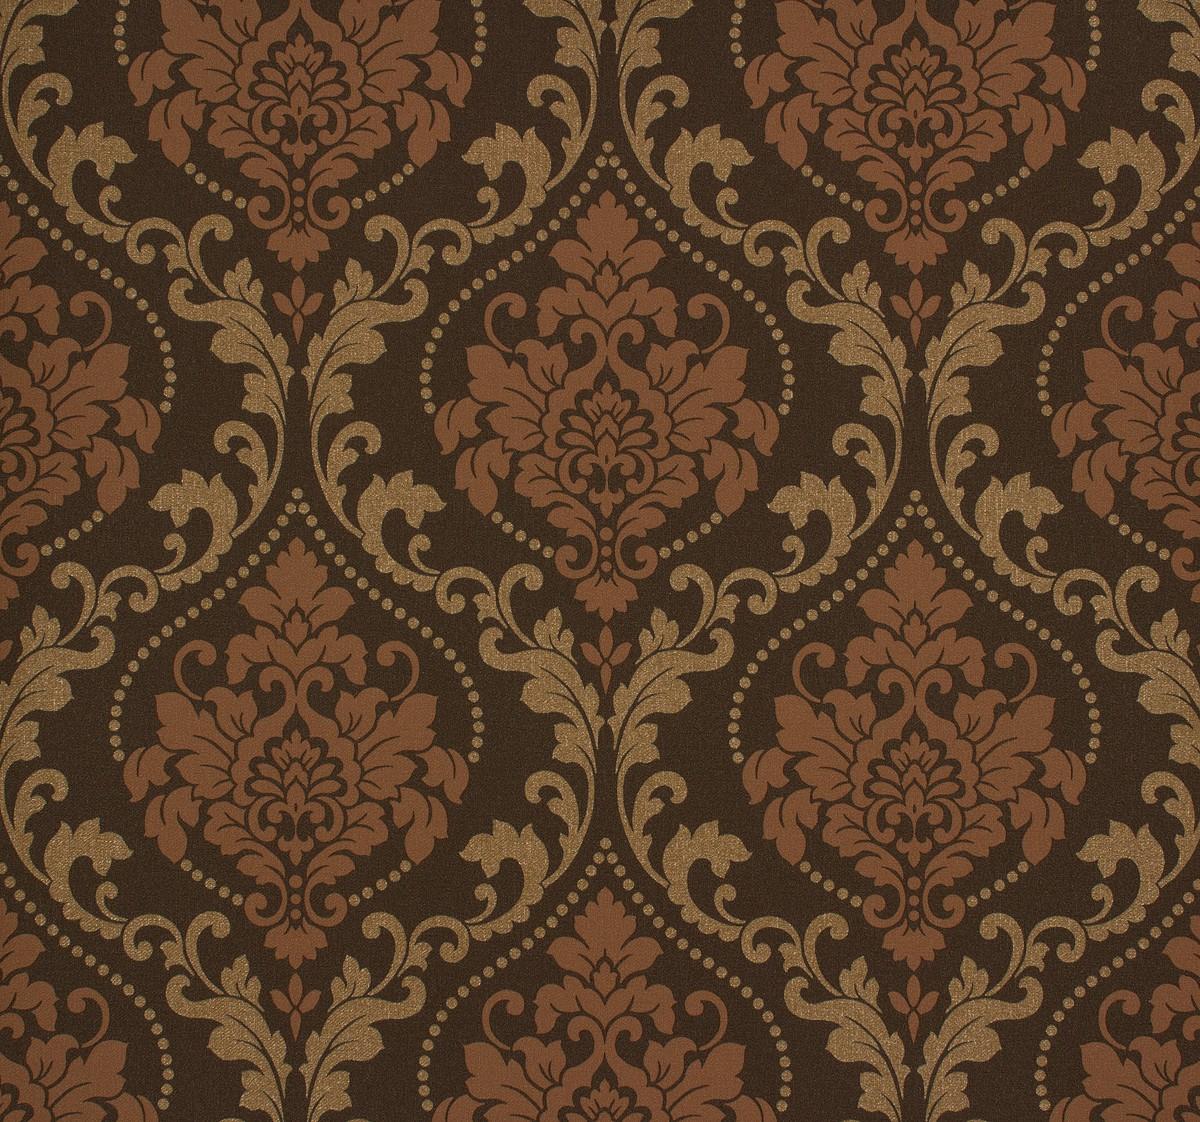 Copper gold wallpaper - Rasch ornament tapete ...